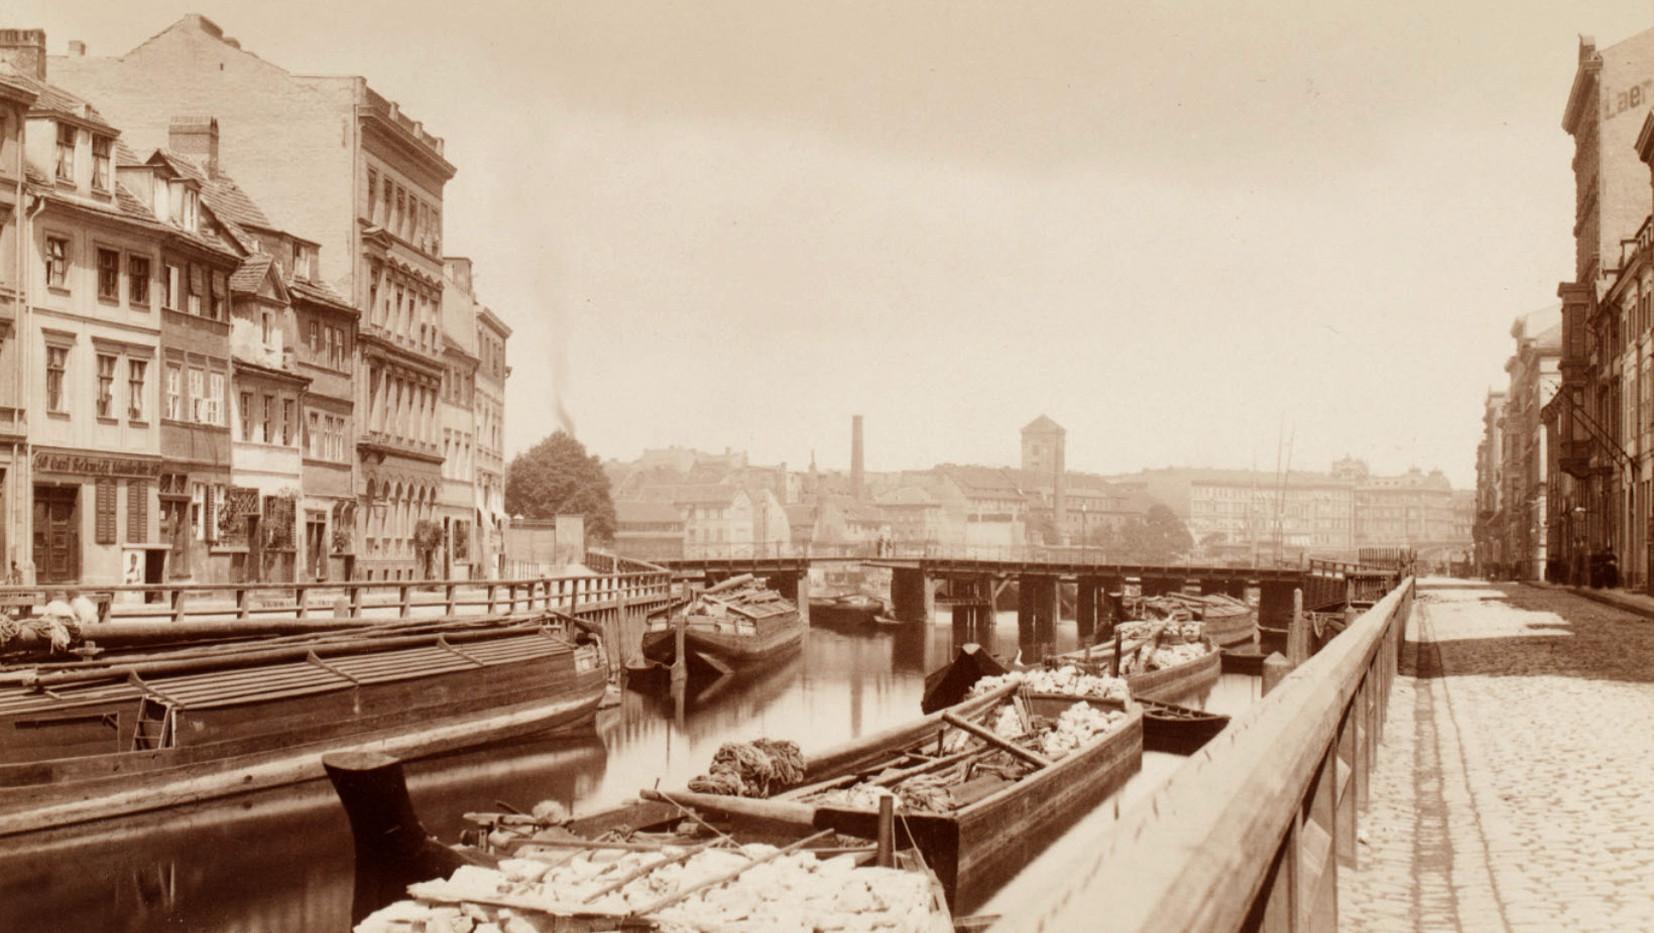 F. Albert Schwartz, Inselbrücke, 1885